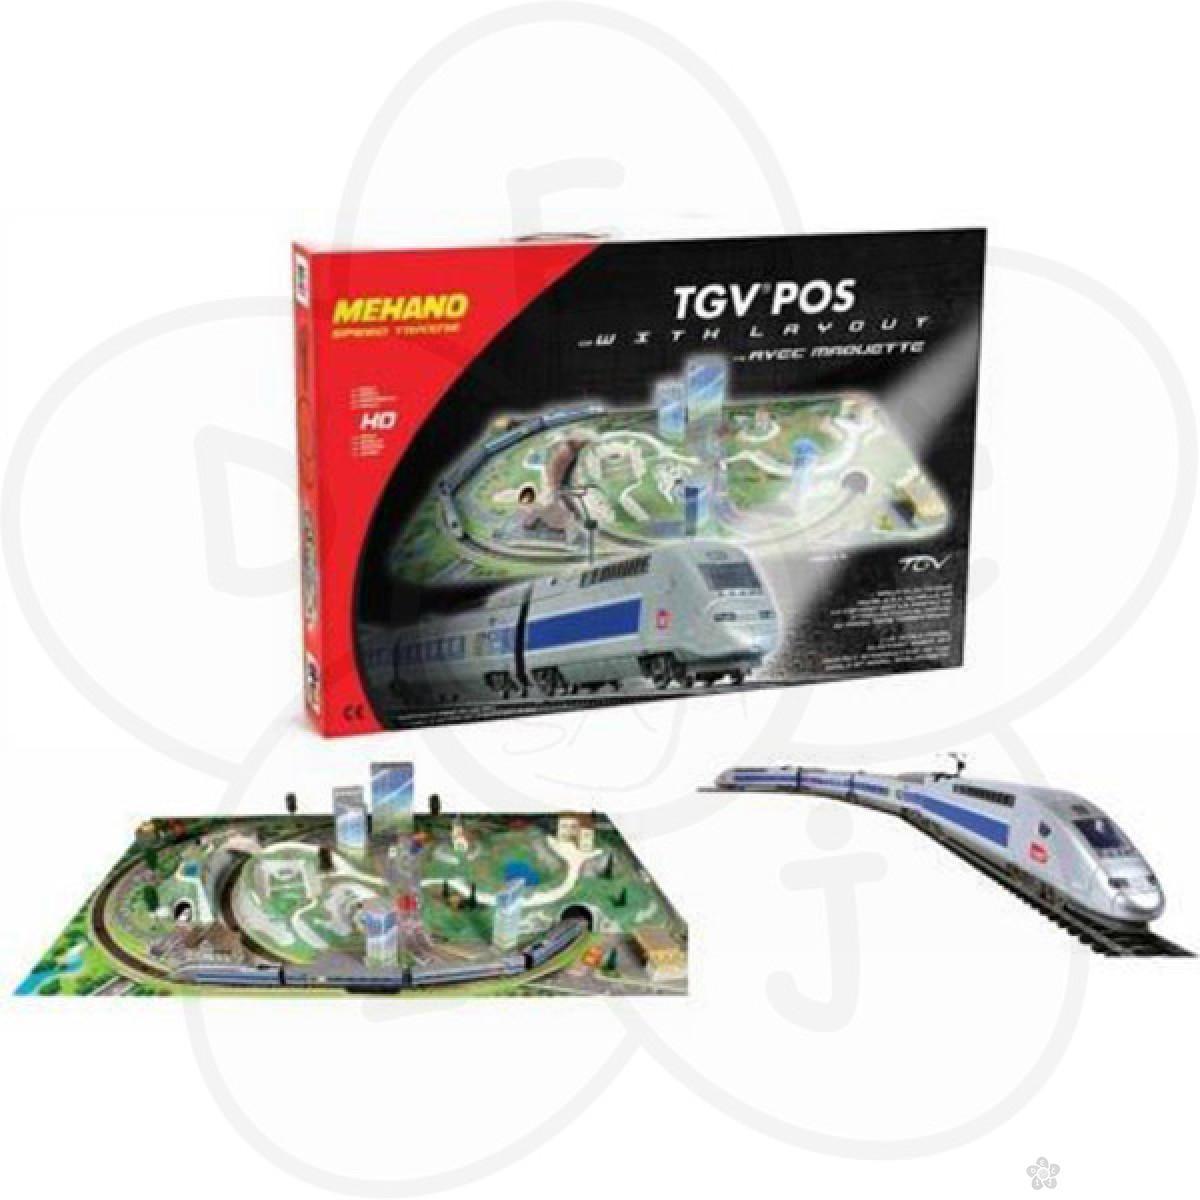 Mehano voz na električni pogon TGV POS + maketa